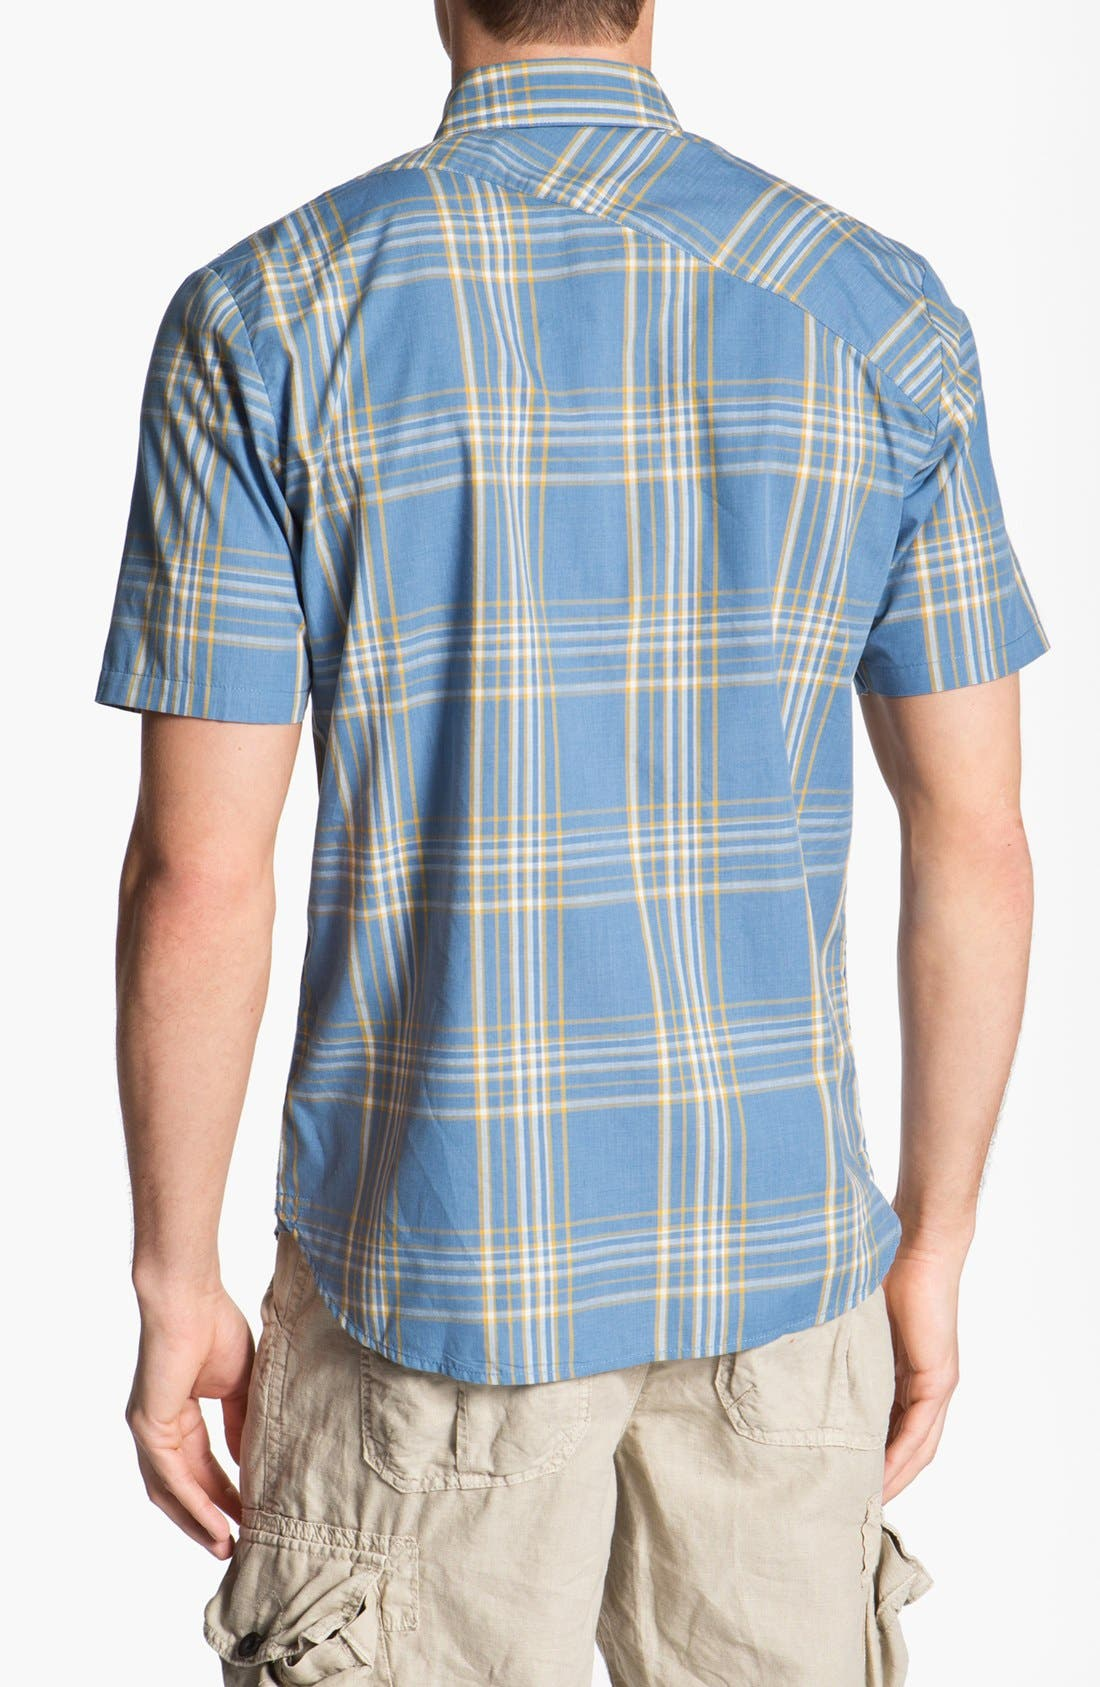 Alternate Image 2  - Volcom 'Why Factor' Plaid Woven Shirt